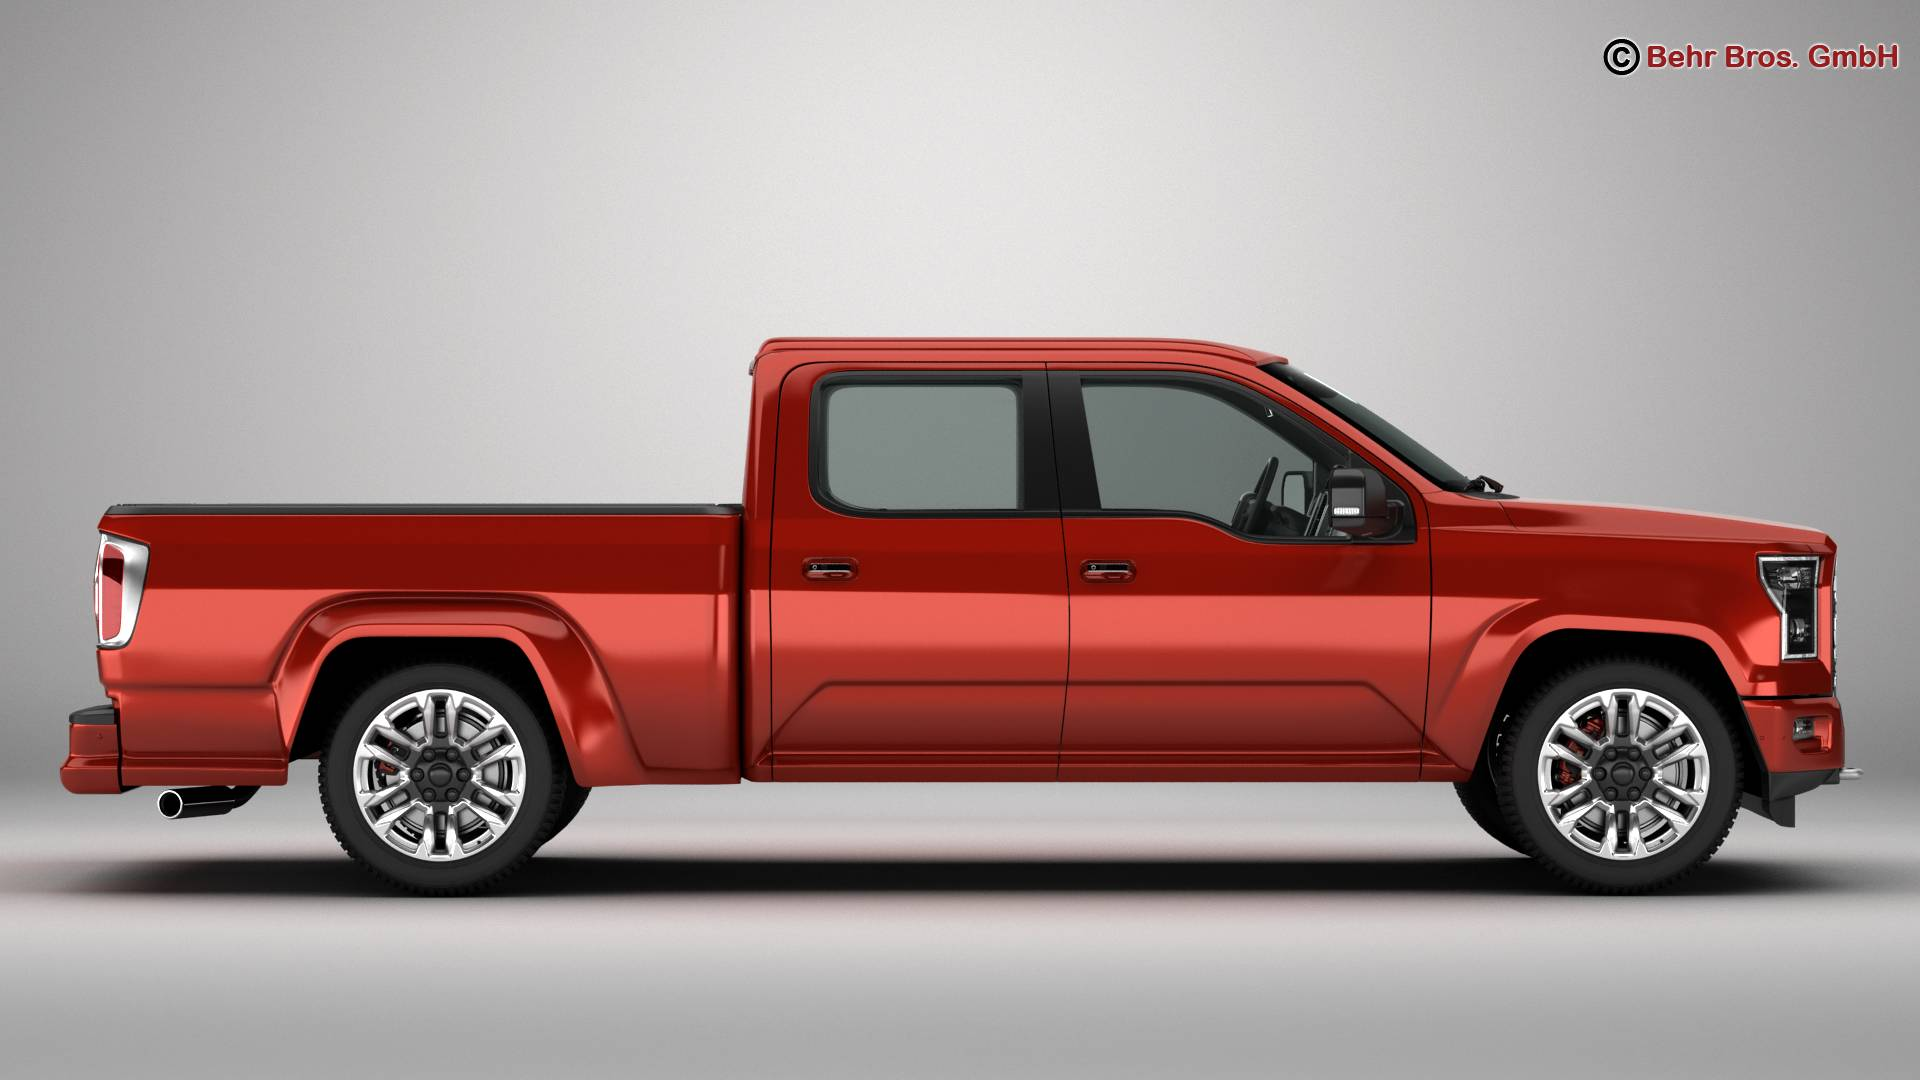 generic pickup 3d model 3ds max fbx c4d lwo ma mb obj 219872